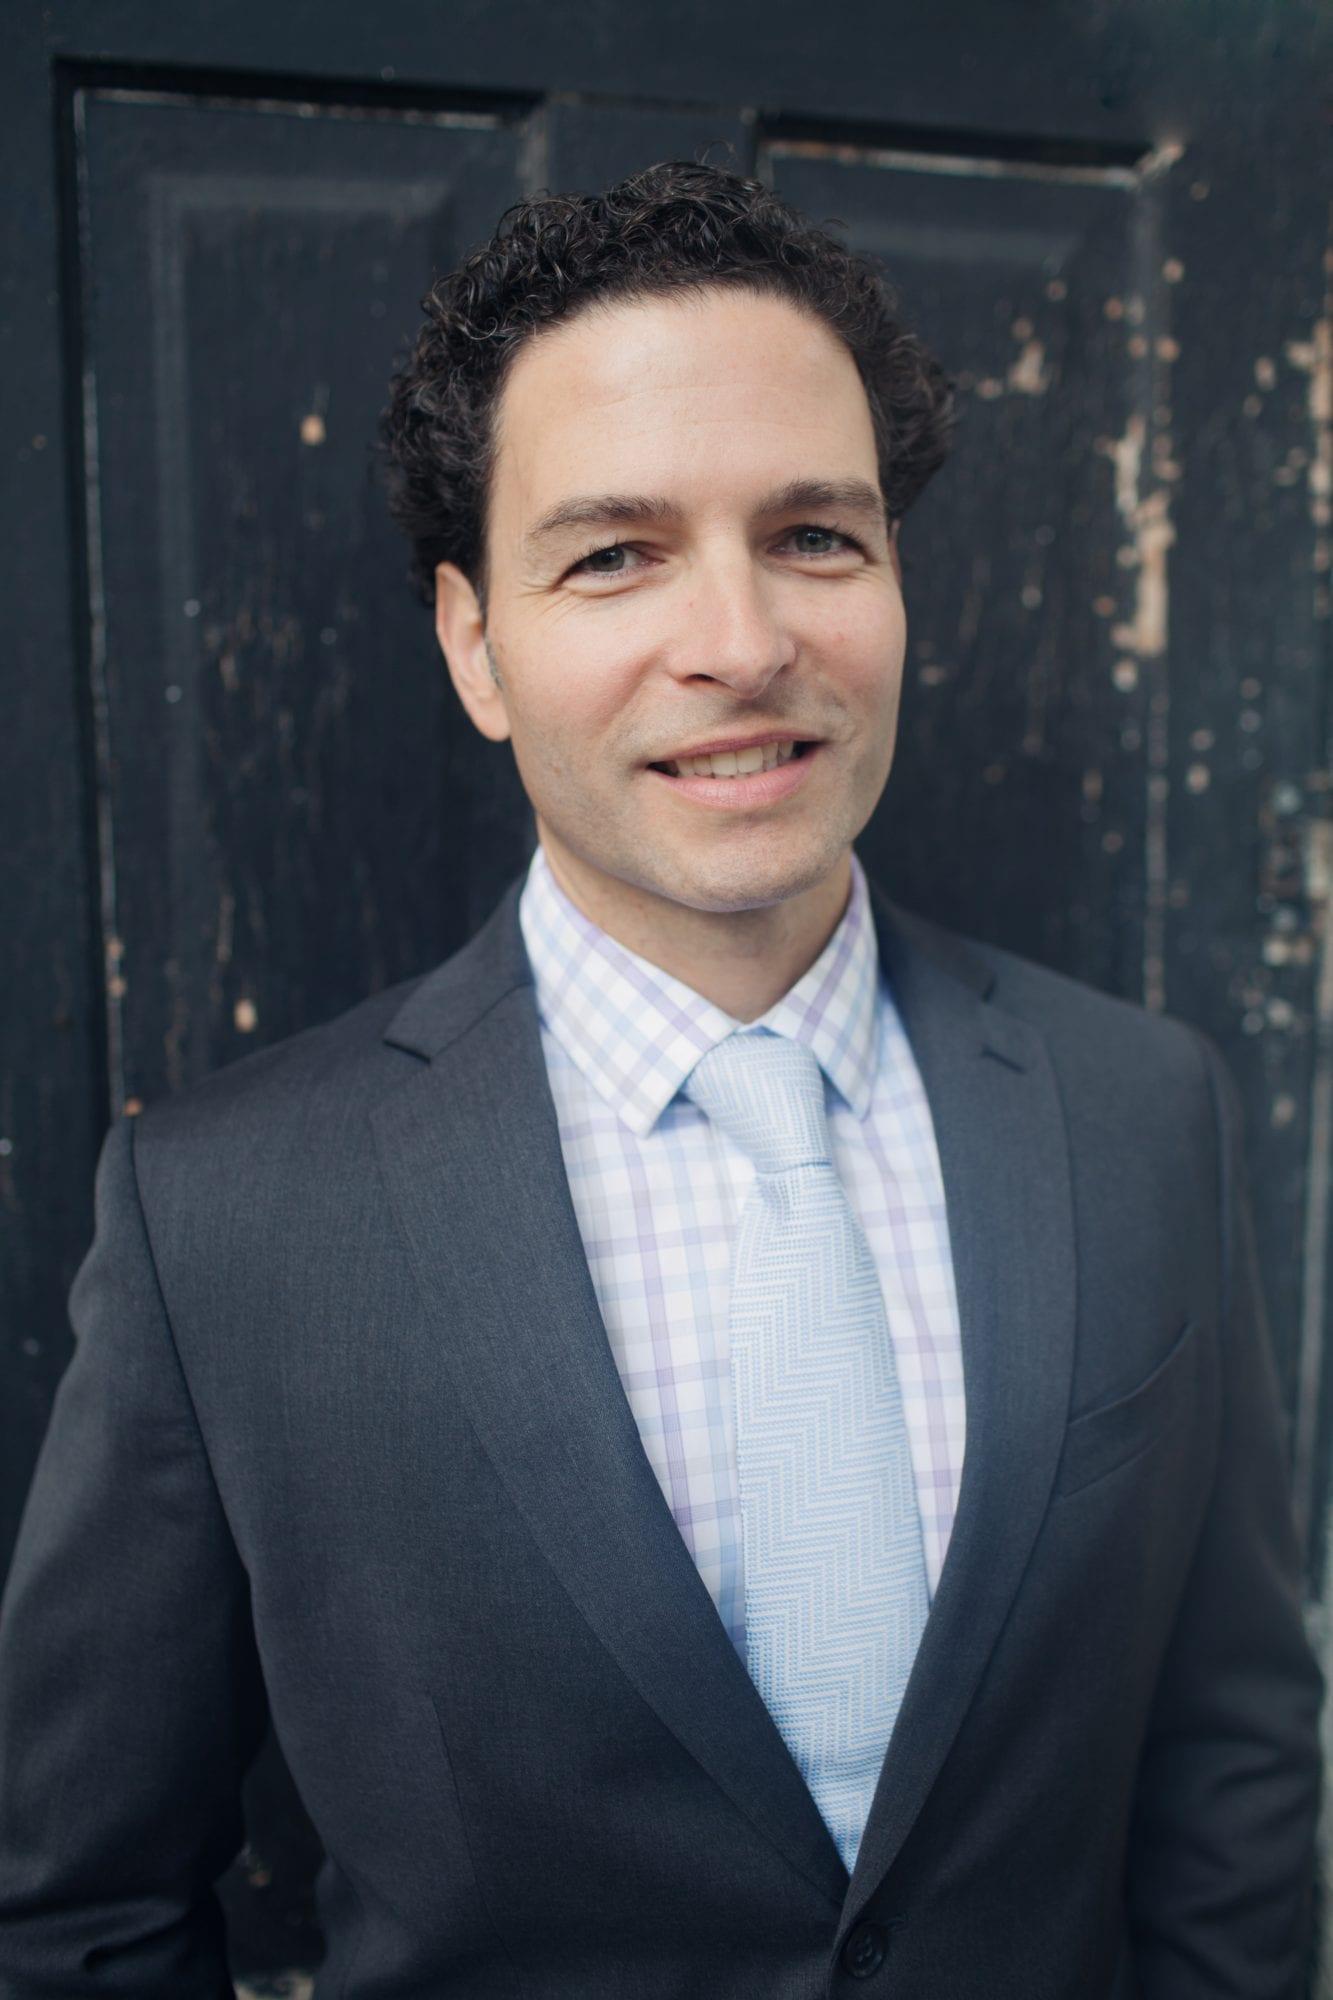 business-professional-profile-photos